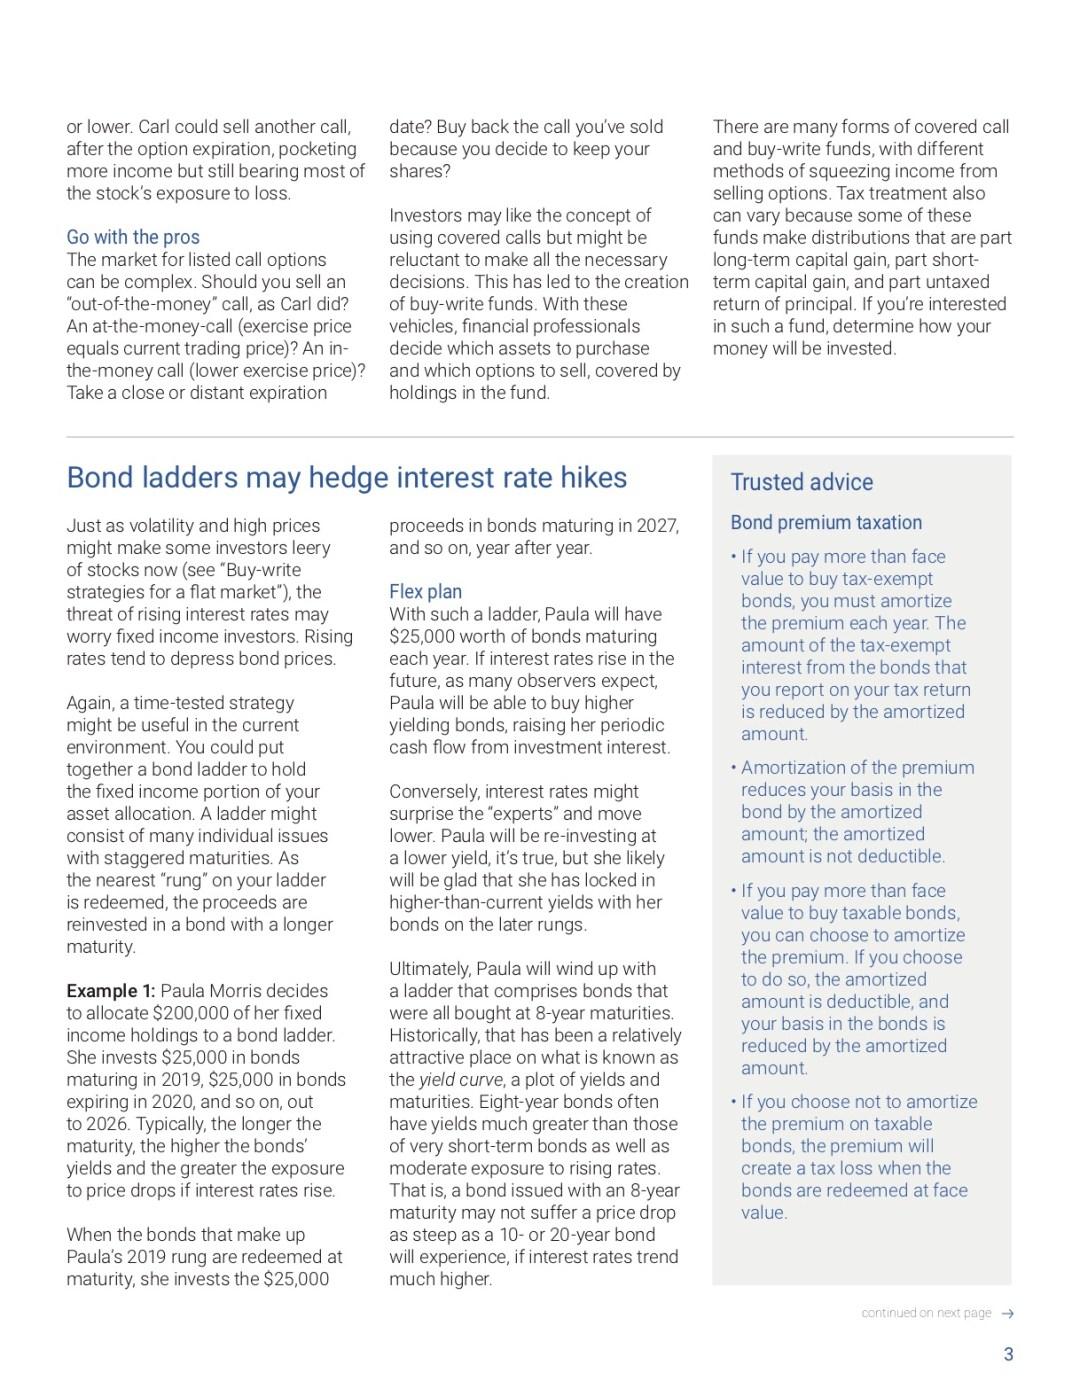 Supreme Court Wayfair, buy-write, bond ladders, tax calendar